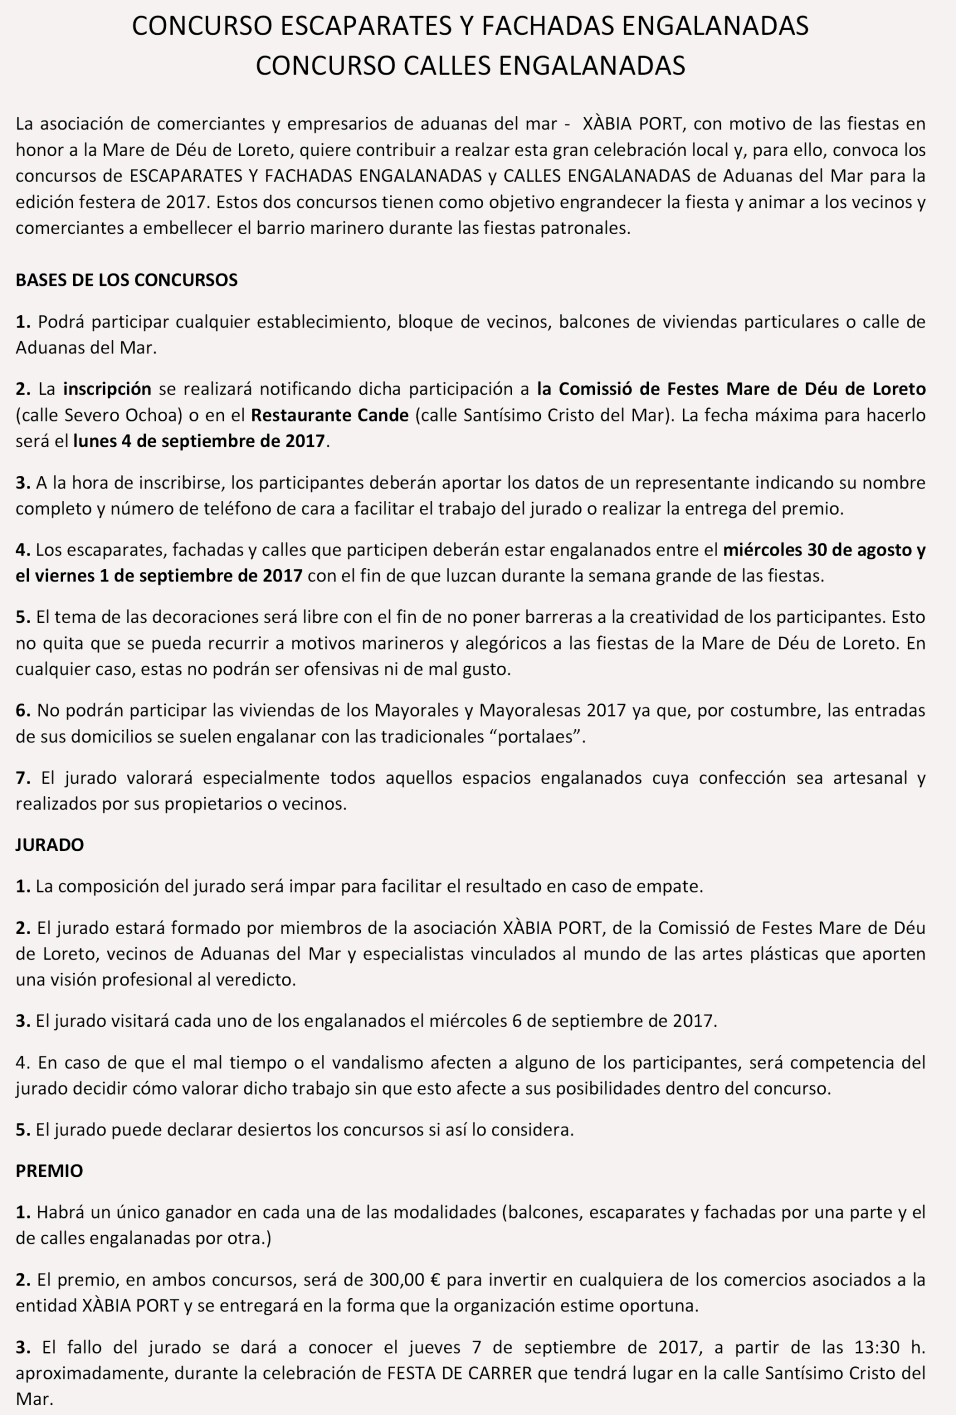 Bases Concursos Engalanados XÀBIA PORT Mare de Déu de Loreto 2